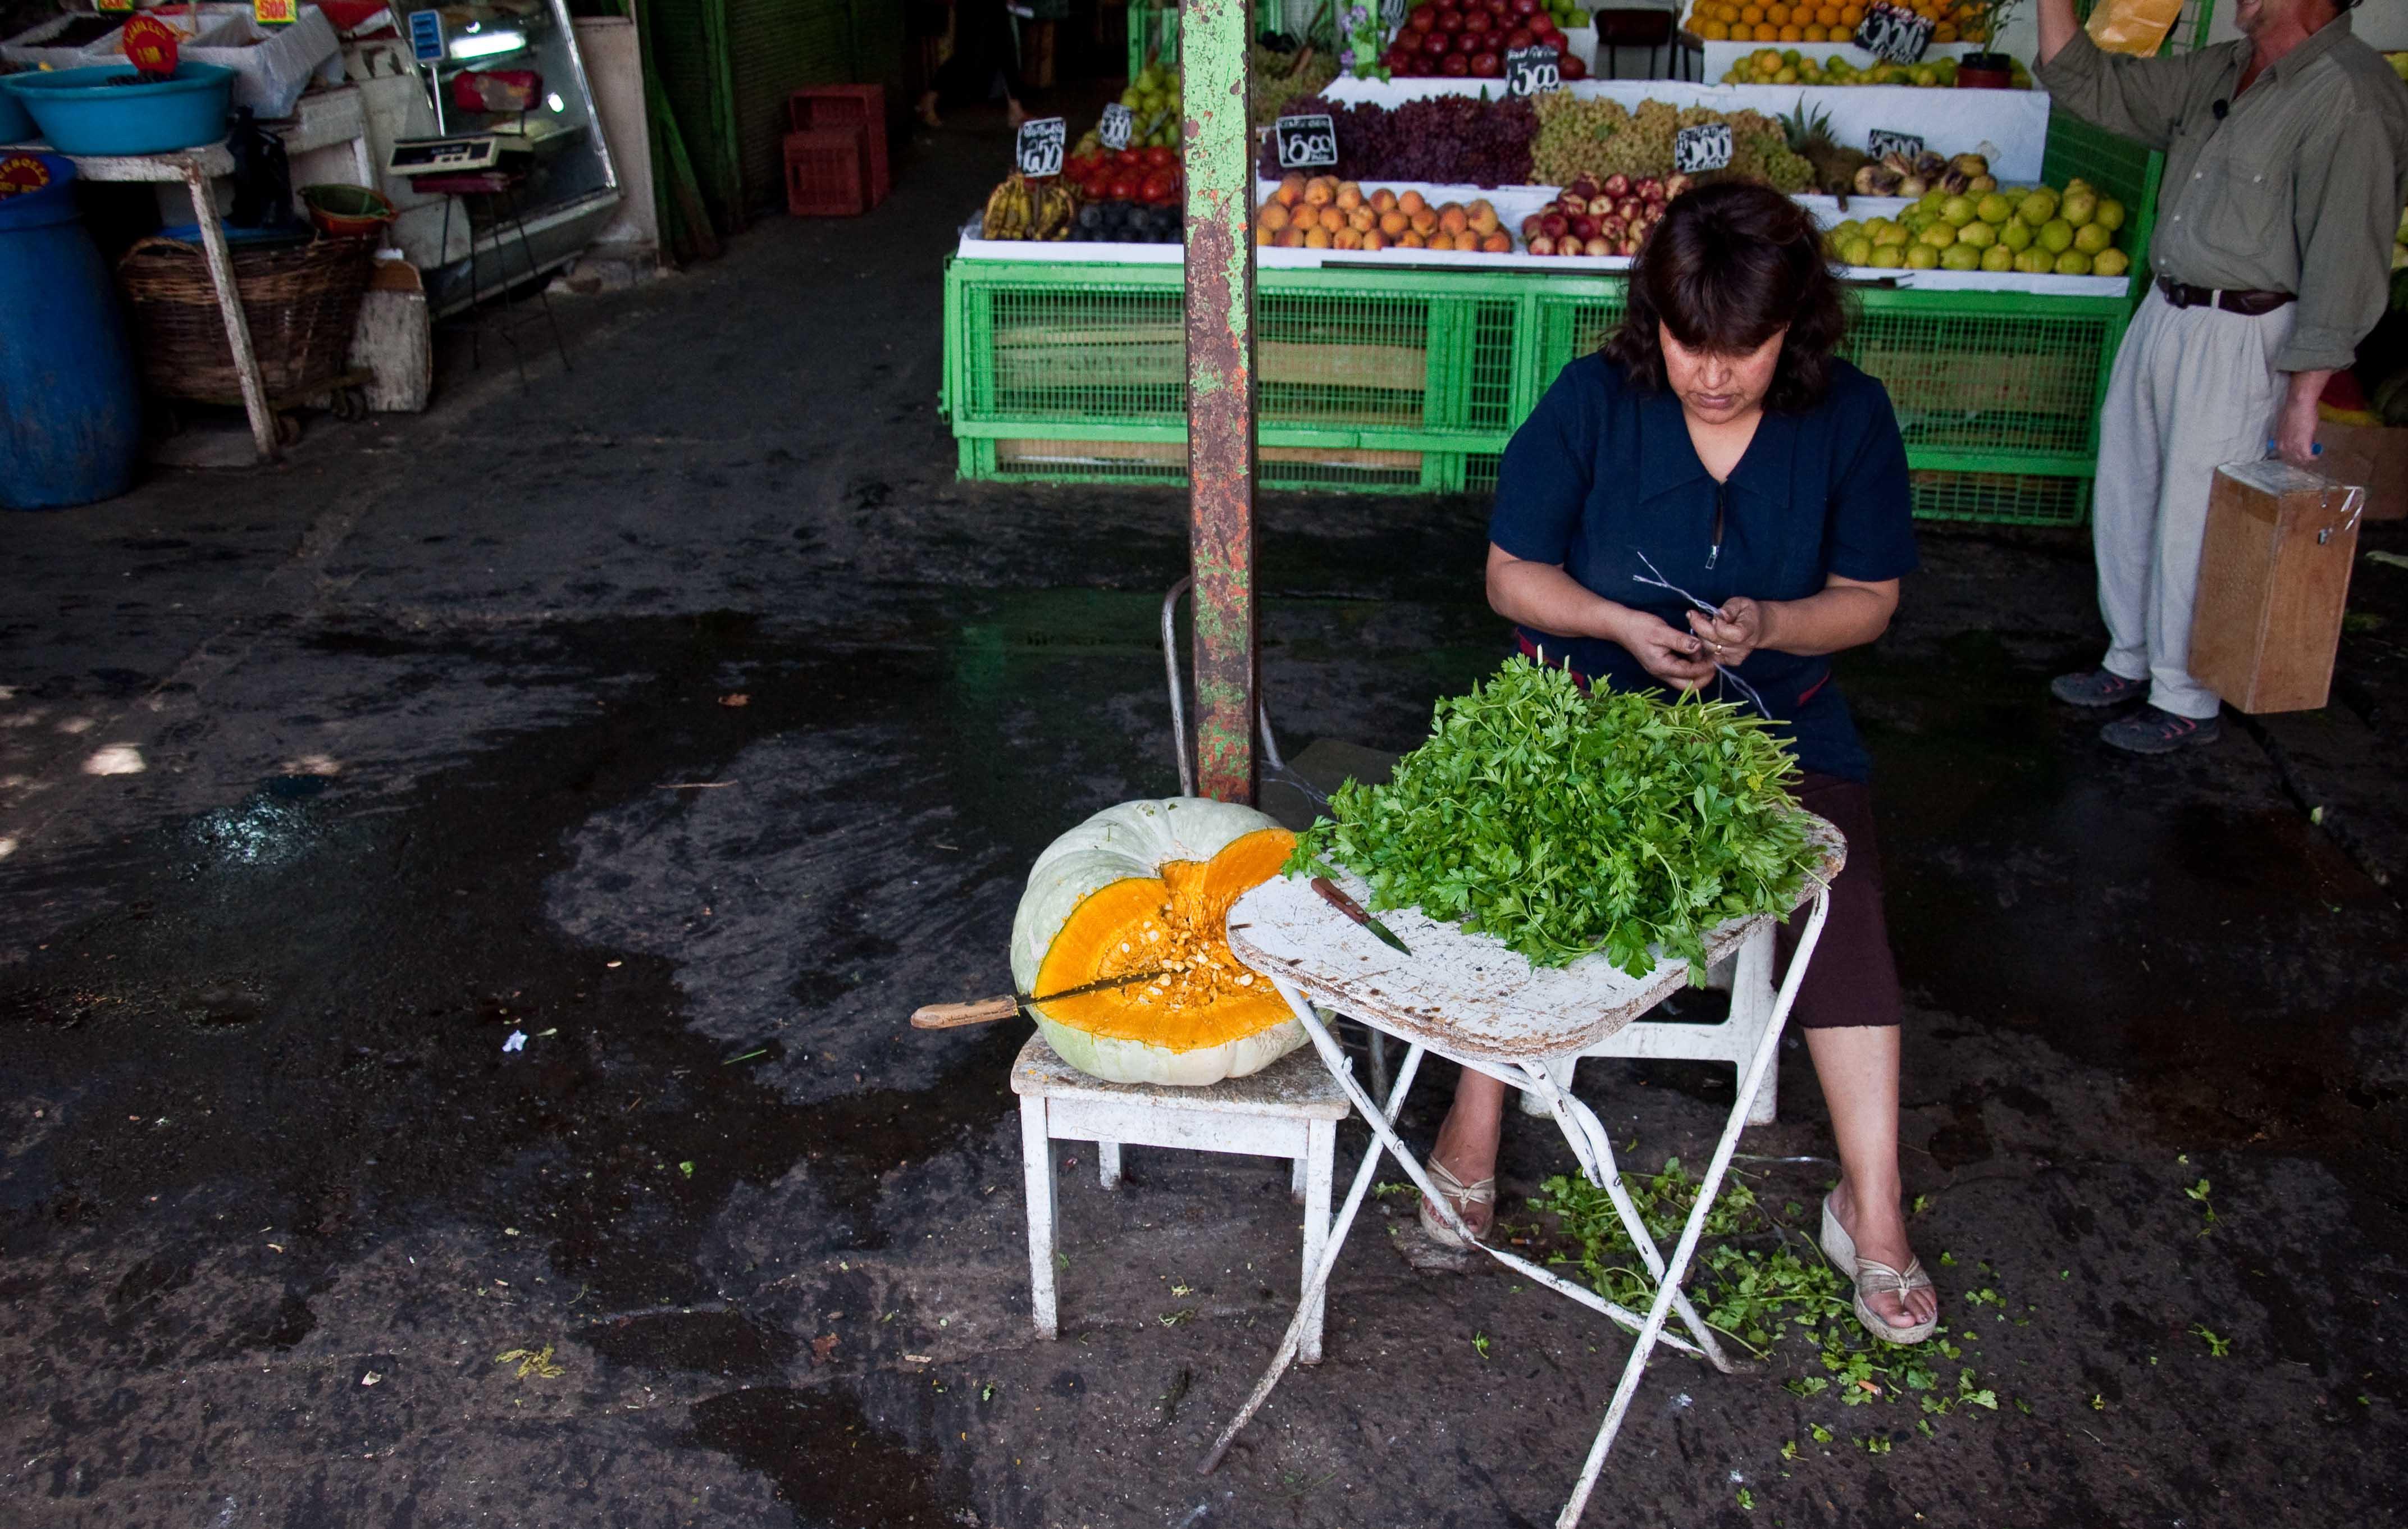 Bunching parsley at Mercado Vega Chica in Santiago